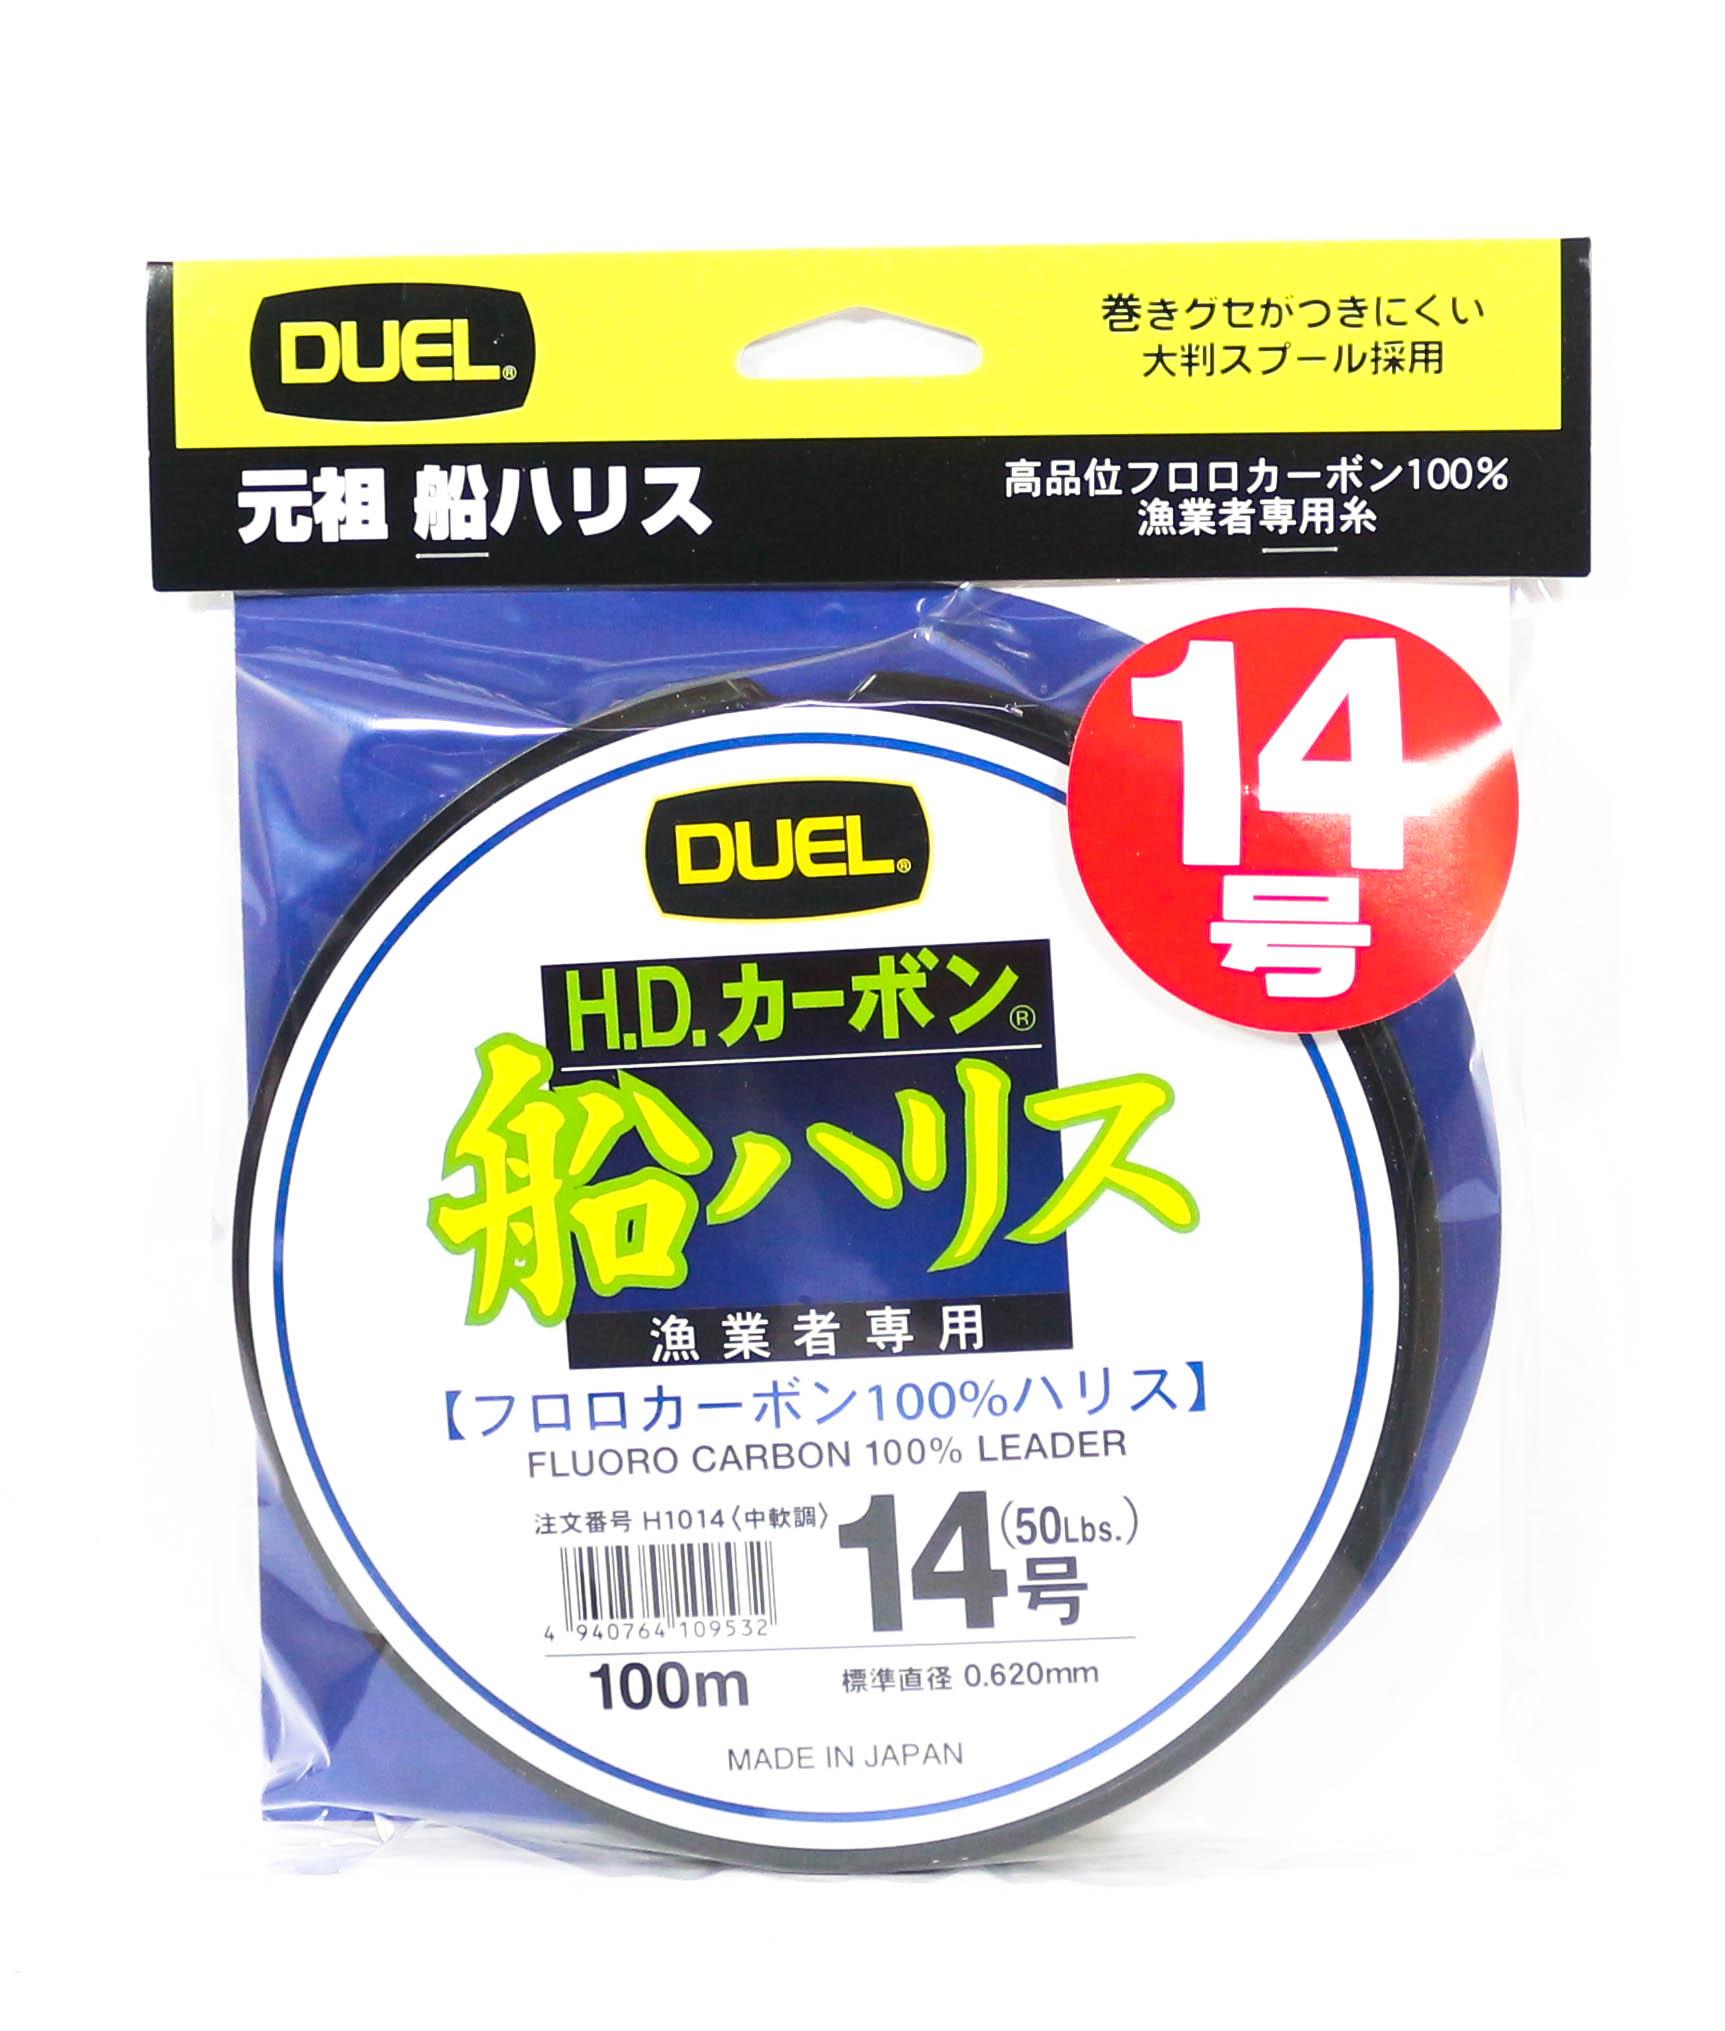 Yo Zuri Duel Fune Leader Fluorocarbon 100m Size 14 50lb 0.62mm H1014 (9532)